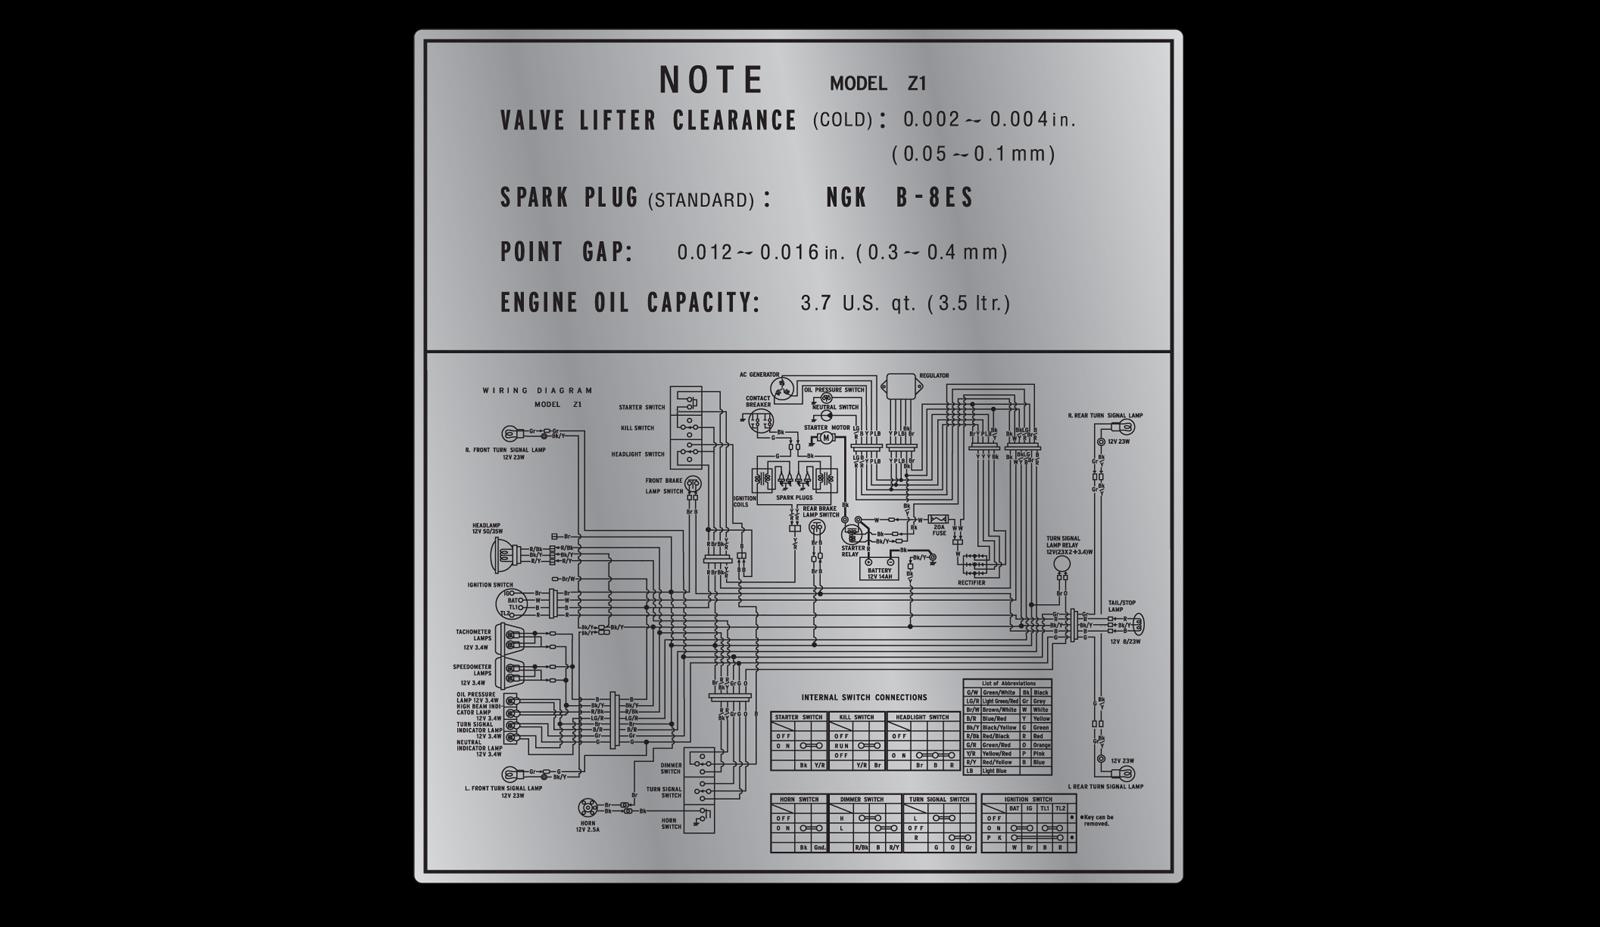 1973 Z1 900 Wiring Diagram Schematics Diagrams 1975 Kawasaki Diablo Cycle U2022 Decals Kz Gpz Zx Models Rh Diablocycle Com